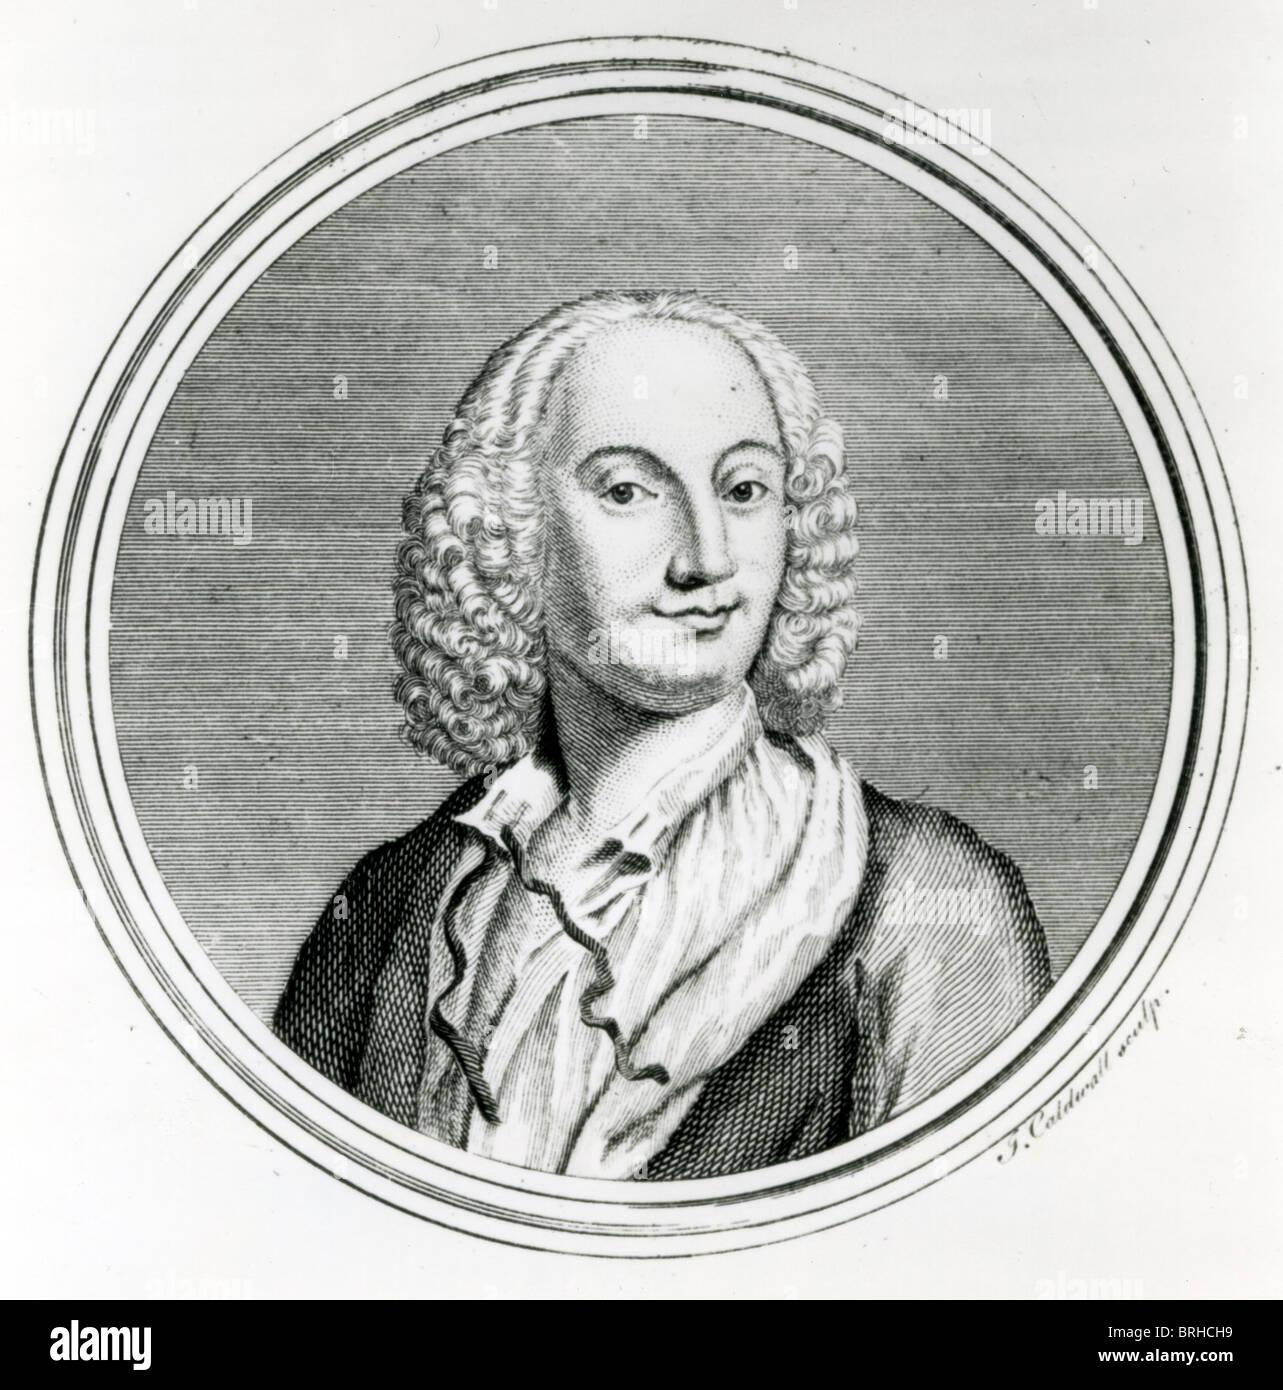 ANTONIO VIVALDI (1678-1741) Italian Baroque composer - Stock Image